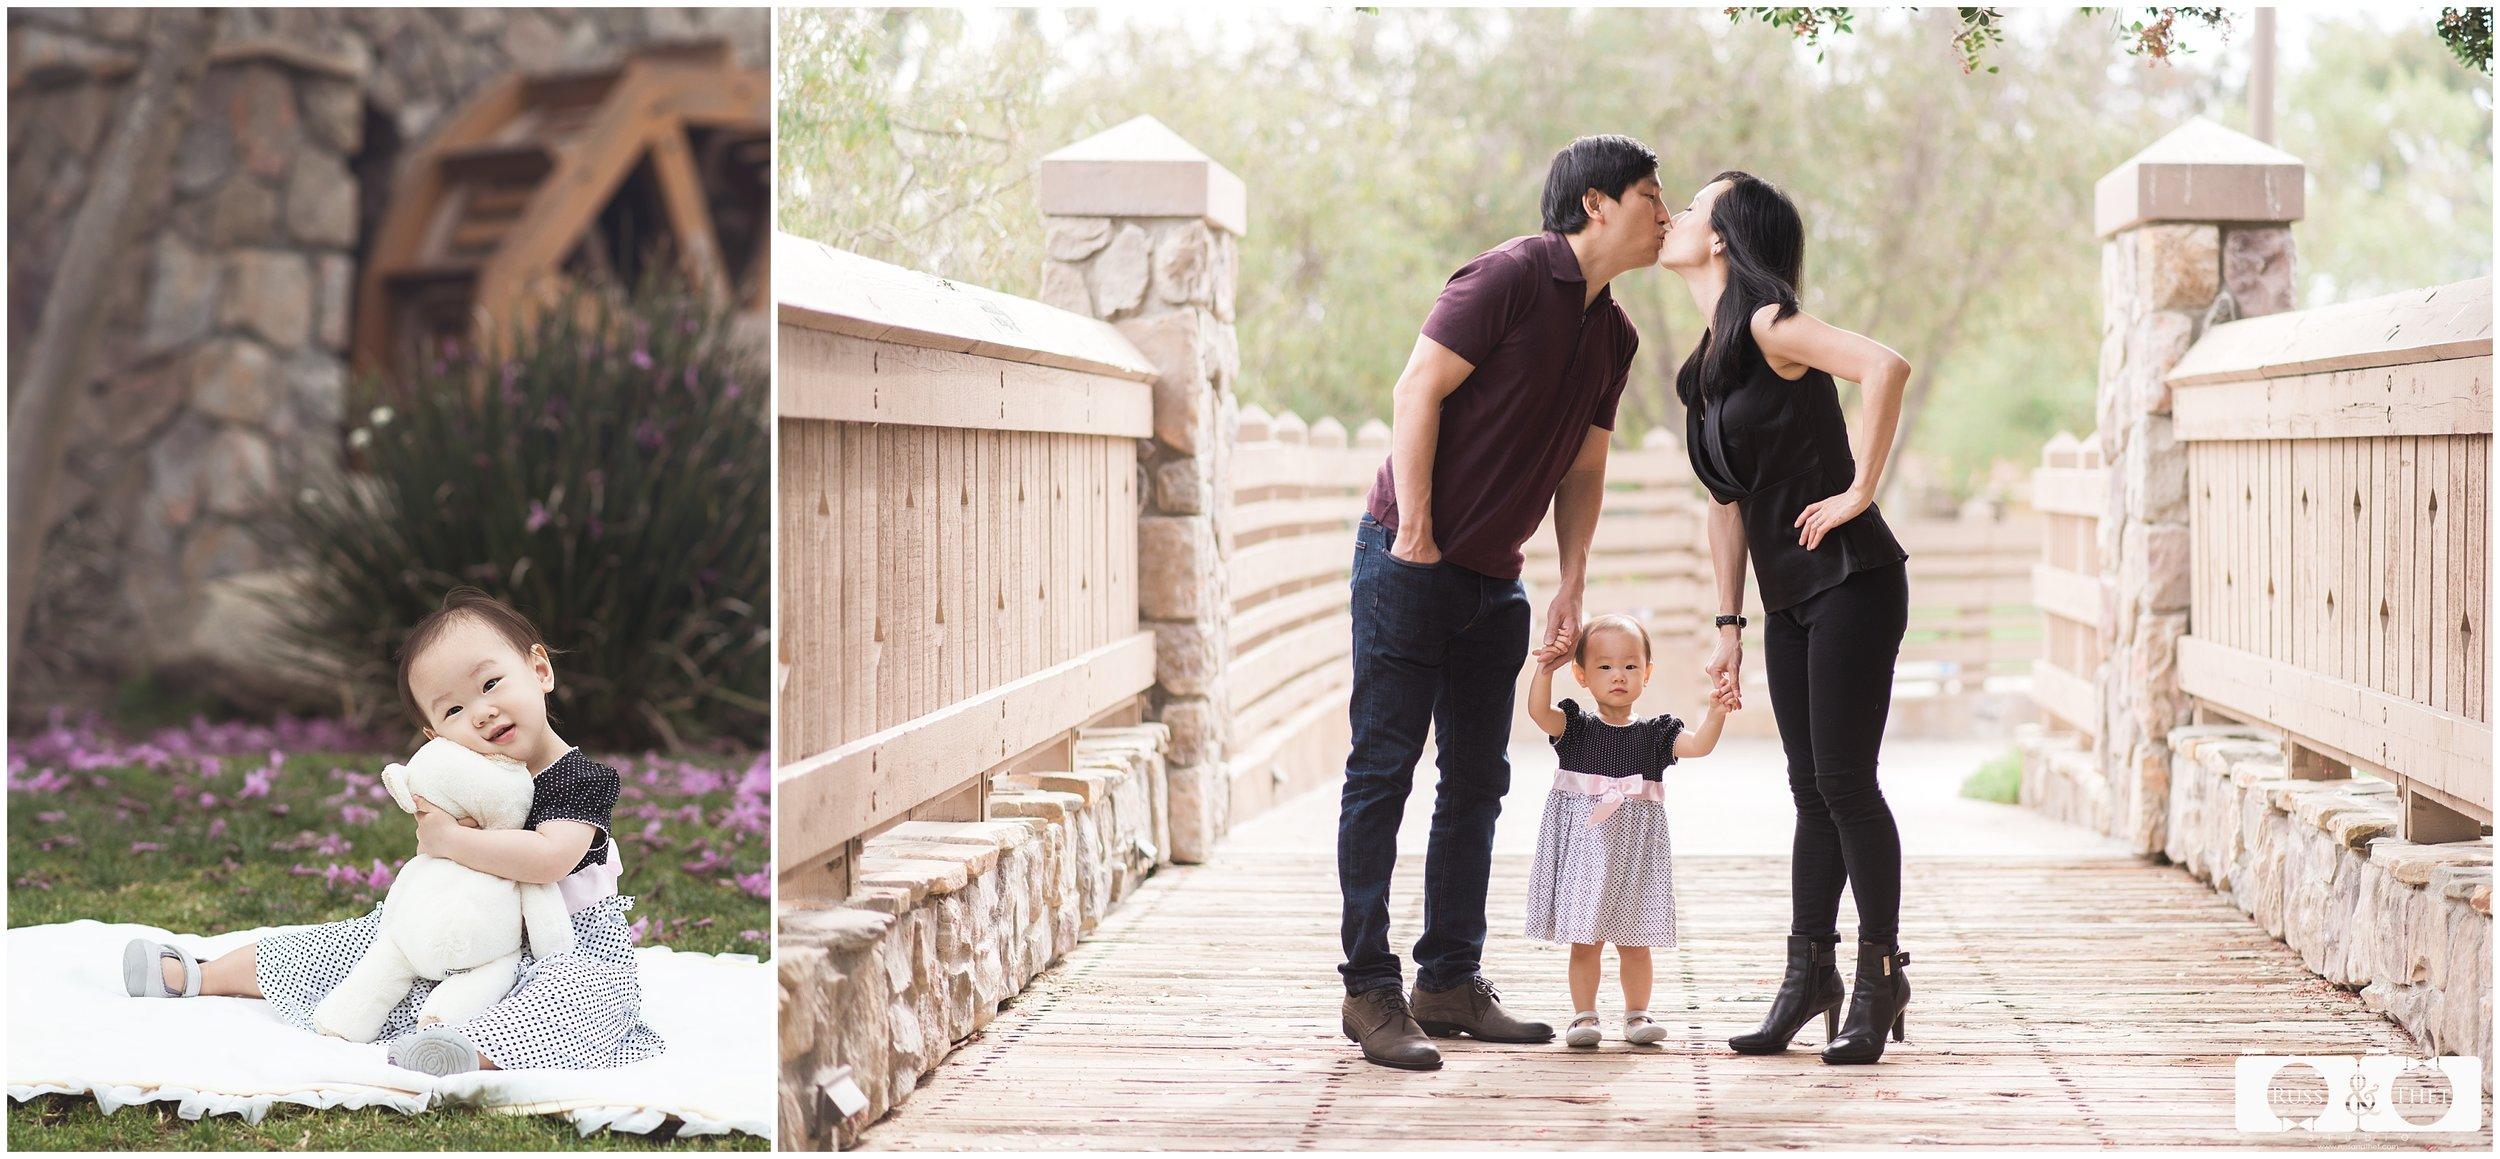 cerritos-heritage-park-family-portraits (1).jpg